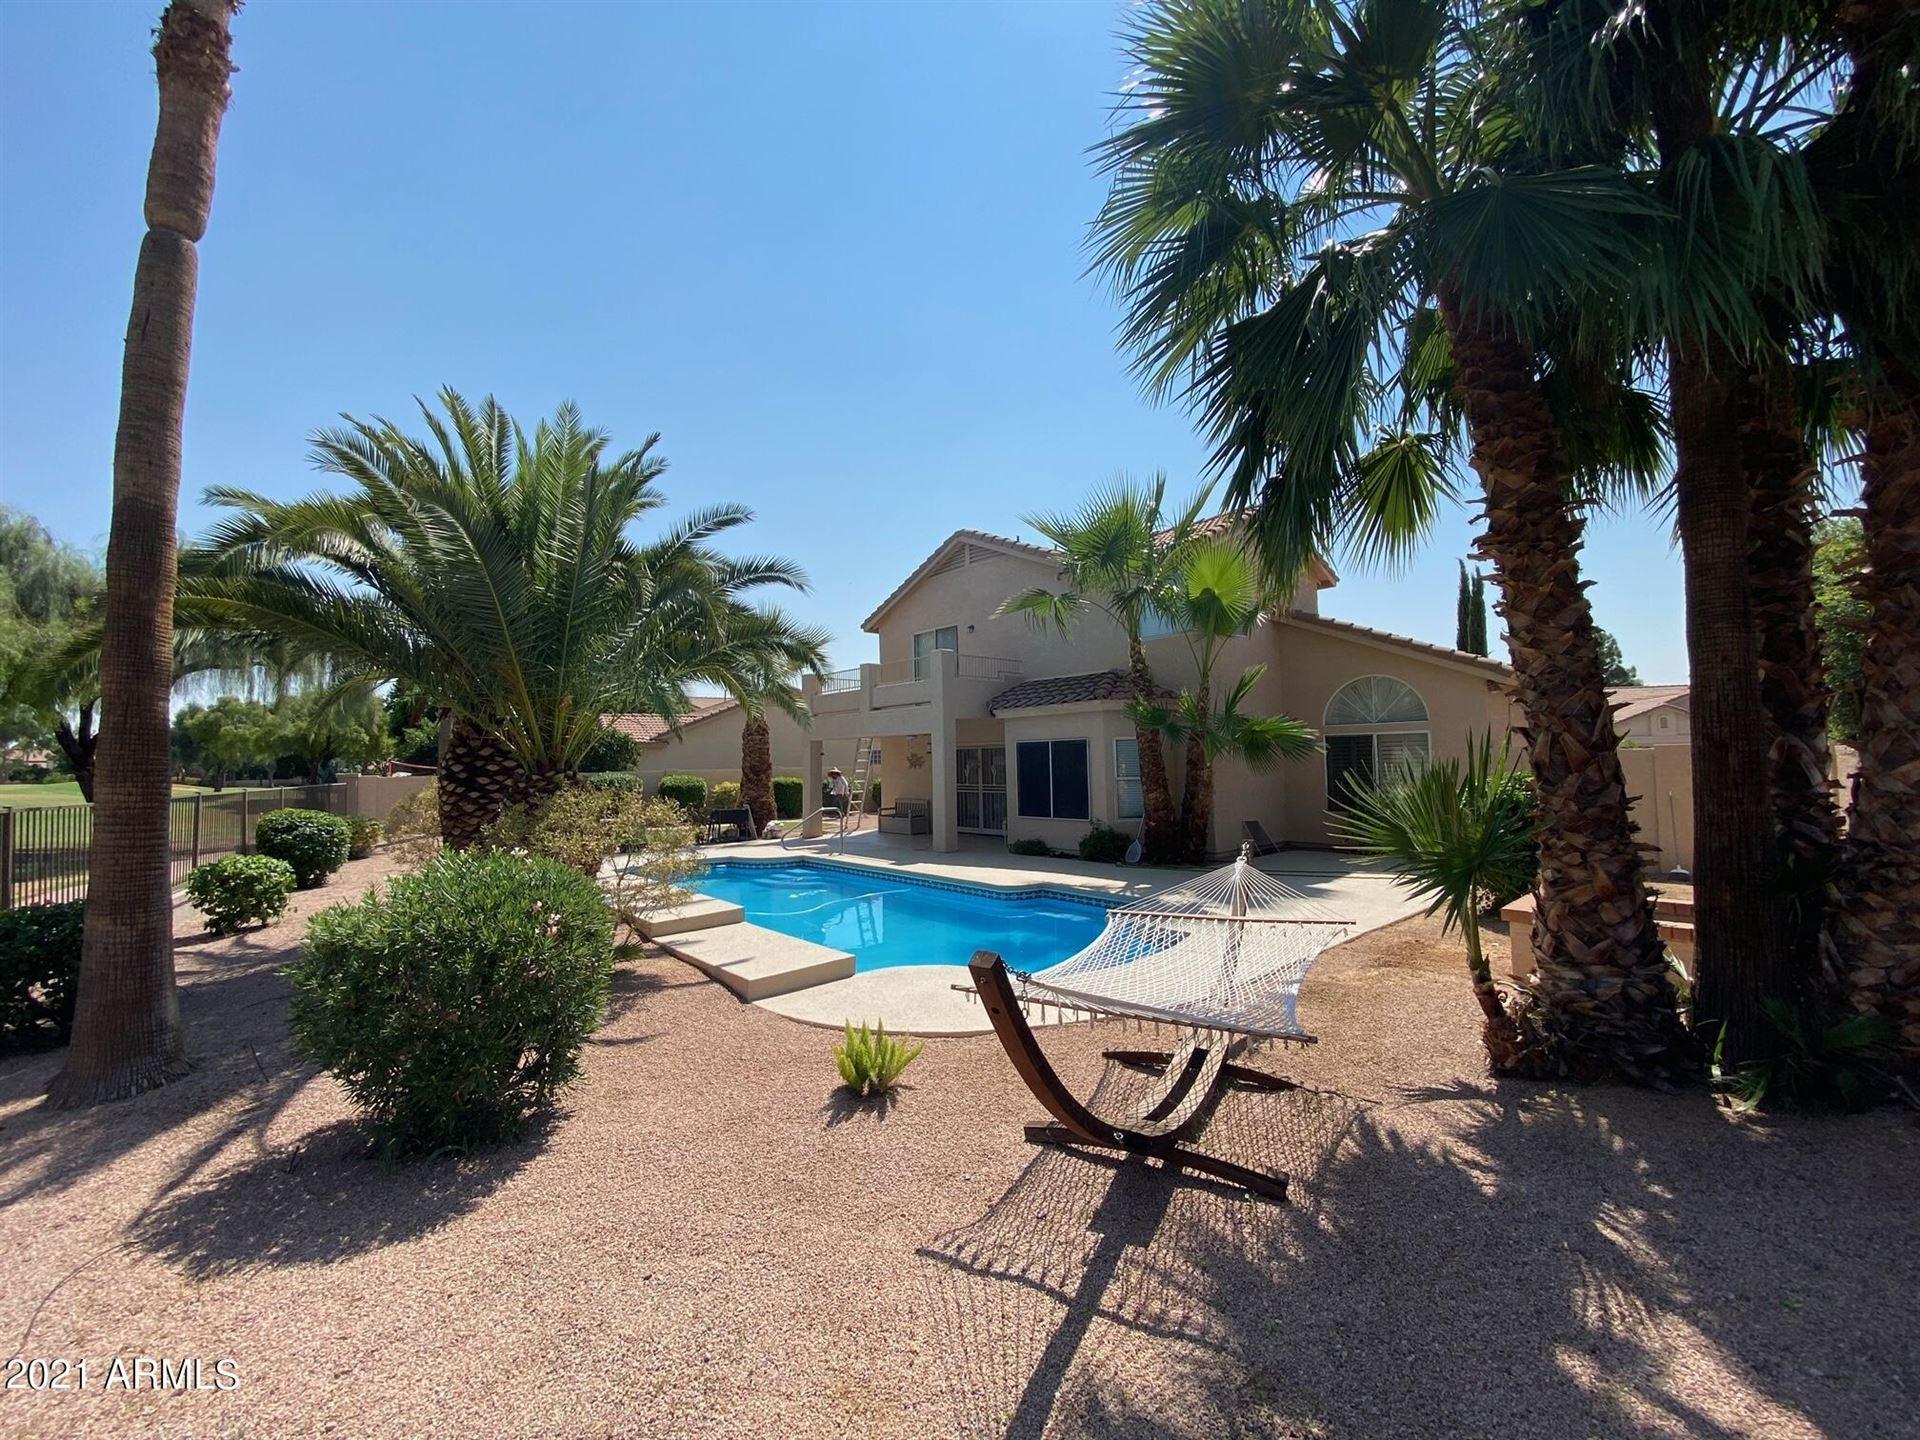 Photo of 6534 W TONOPAH Drive, Glendale, AZ 85308 (MLS # 6295590)